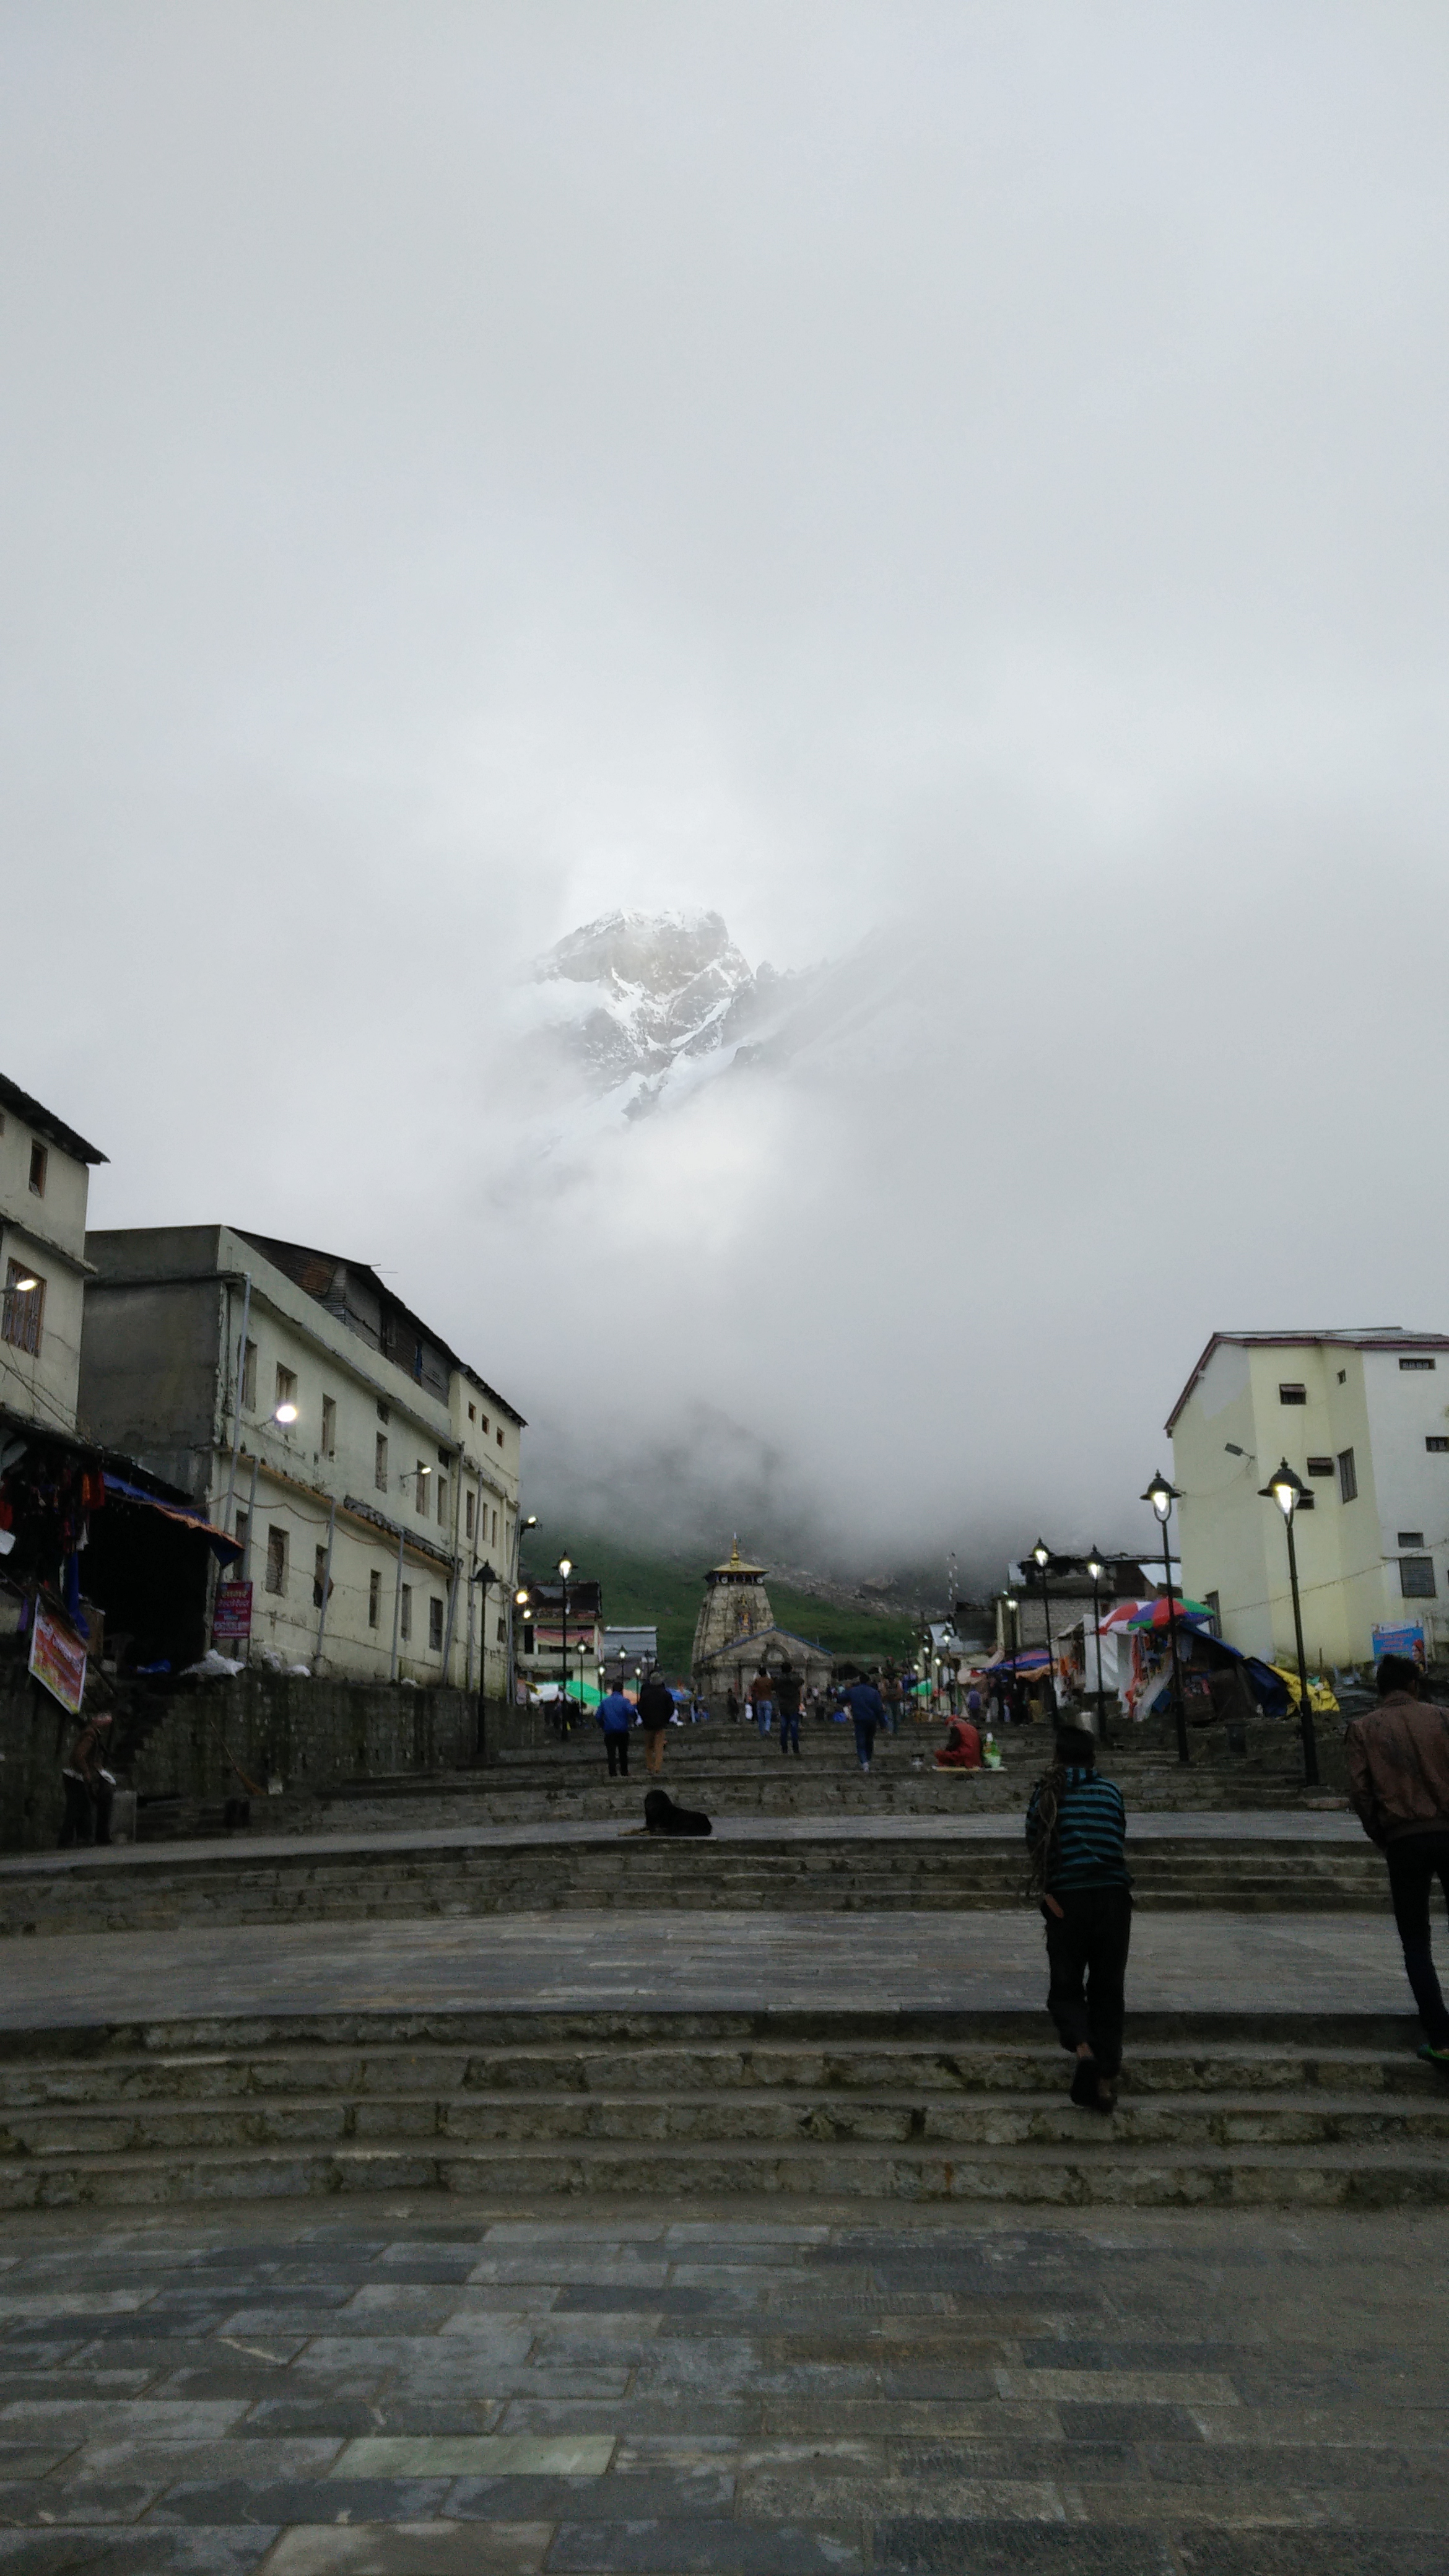 img_20180820_070521-jpg.6894 Shrines in Himalayas